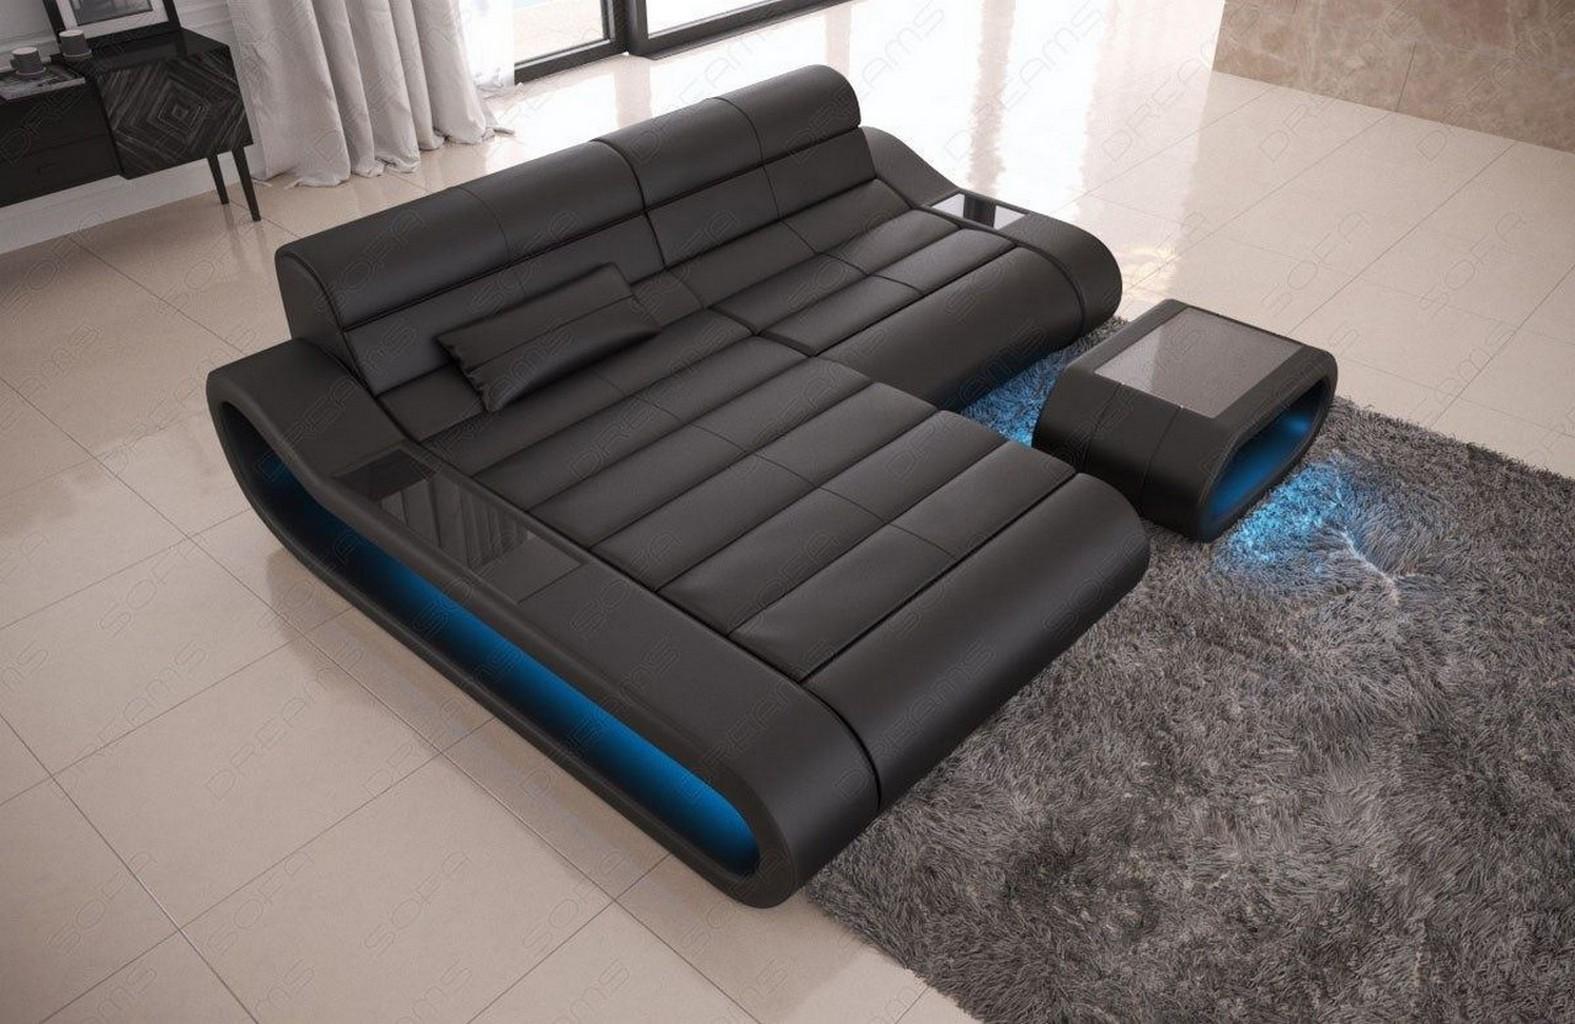 Leder couch designersofa eckcouch modern ottomane concept for Ecksofa klein leder